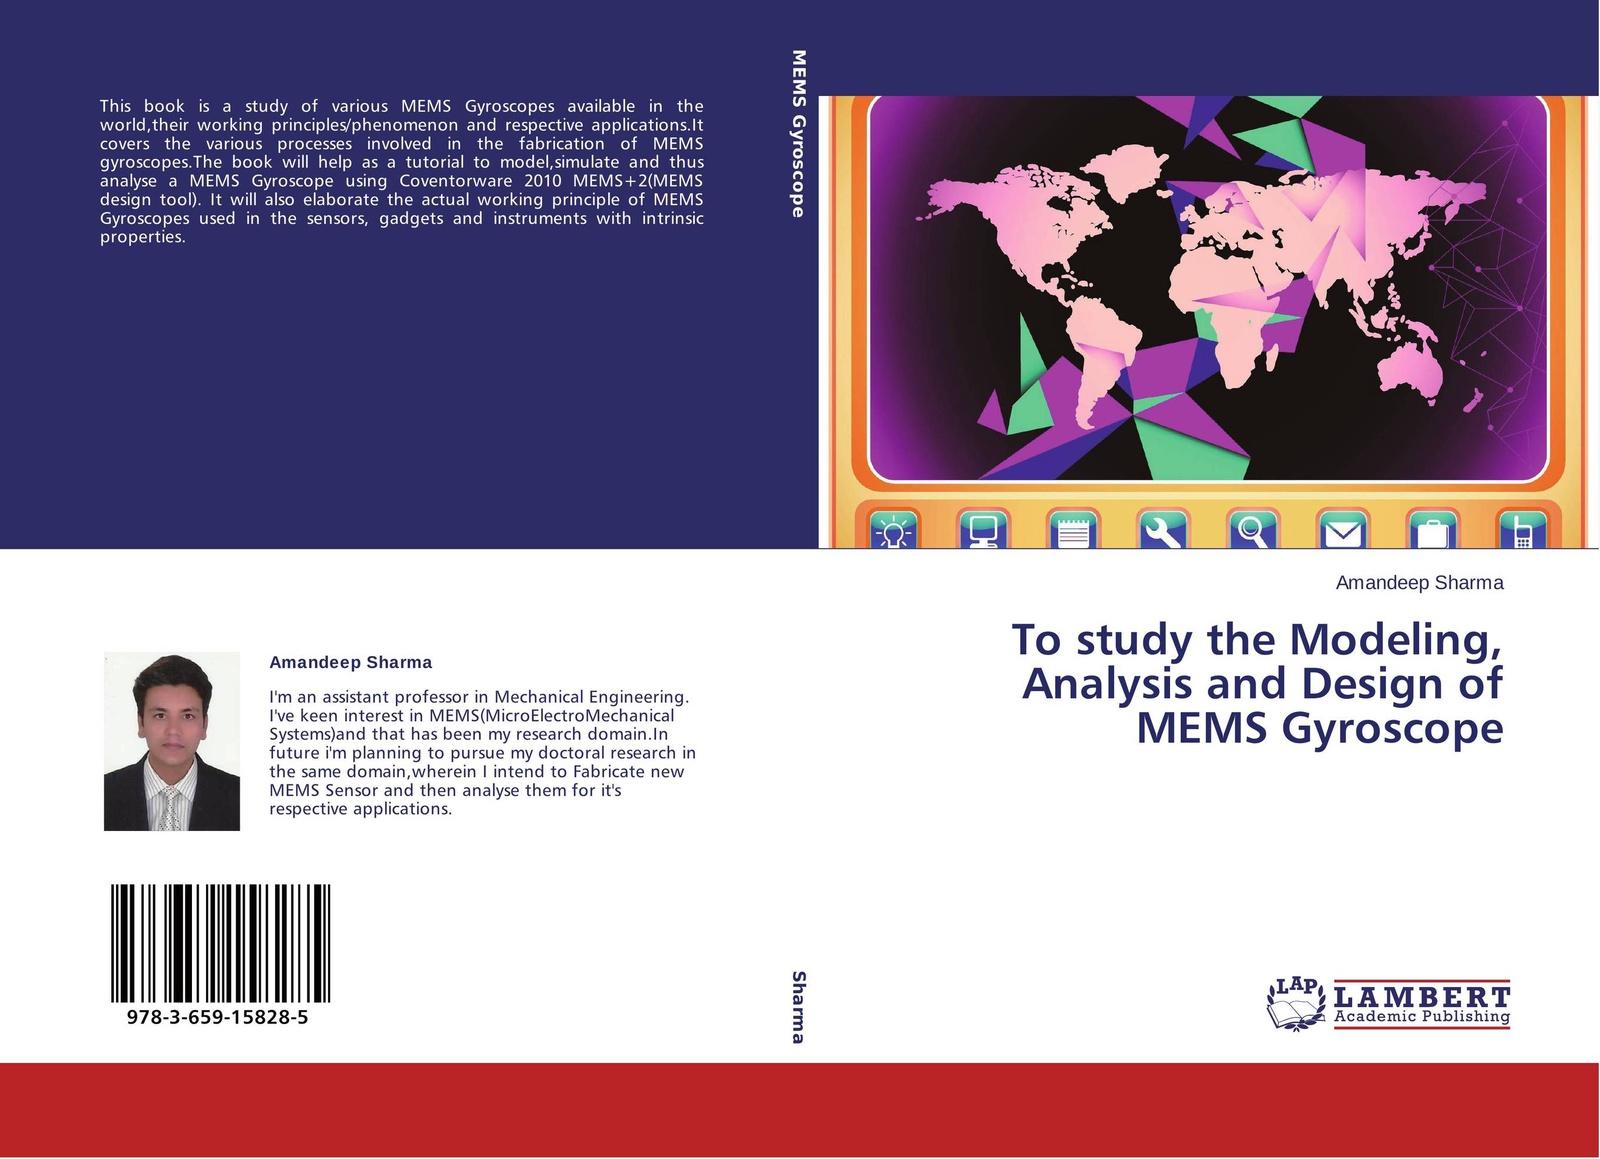 Amandeep Sharma To study the Modeling, Analysis and Design of MEMS Gyroscope